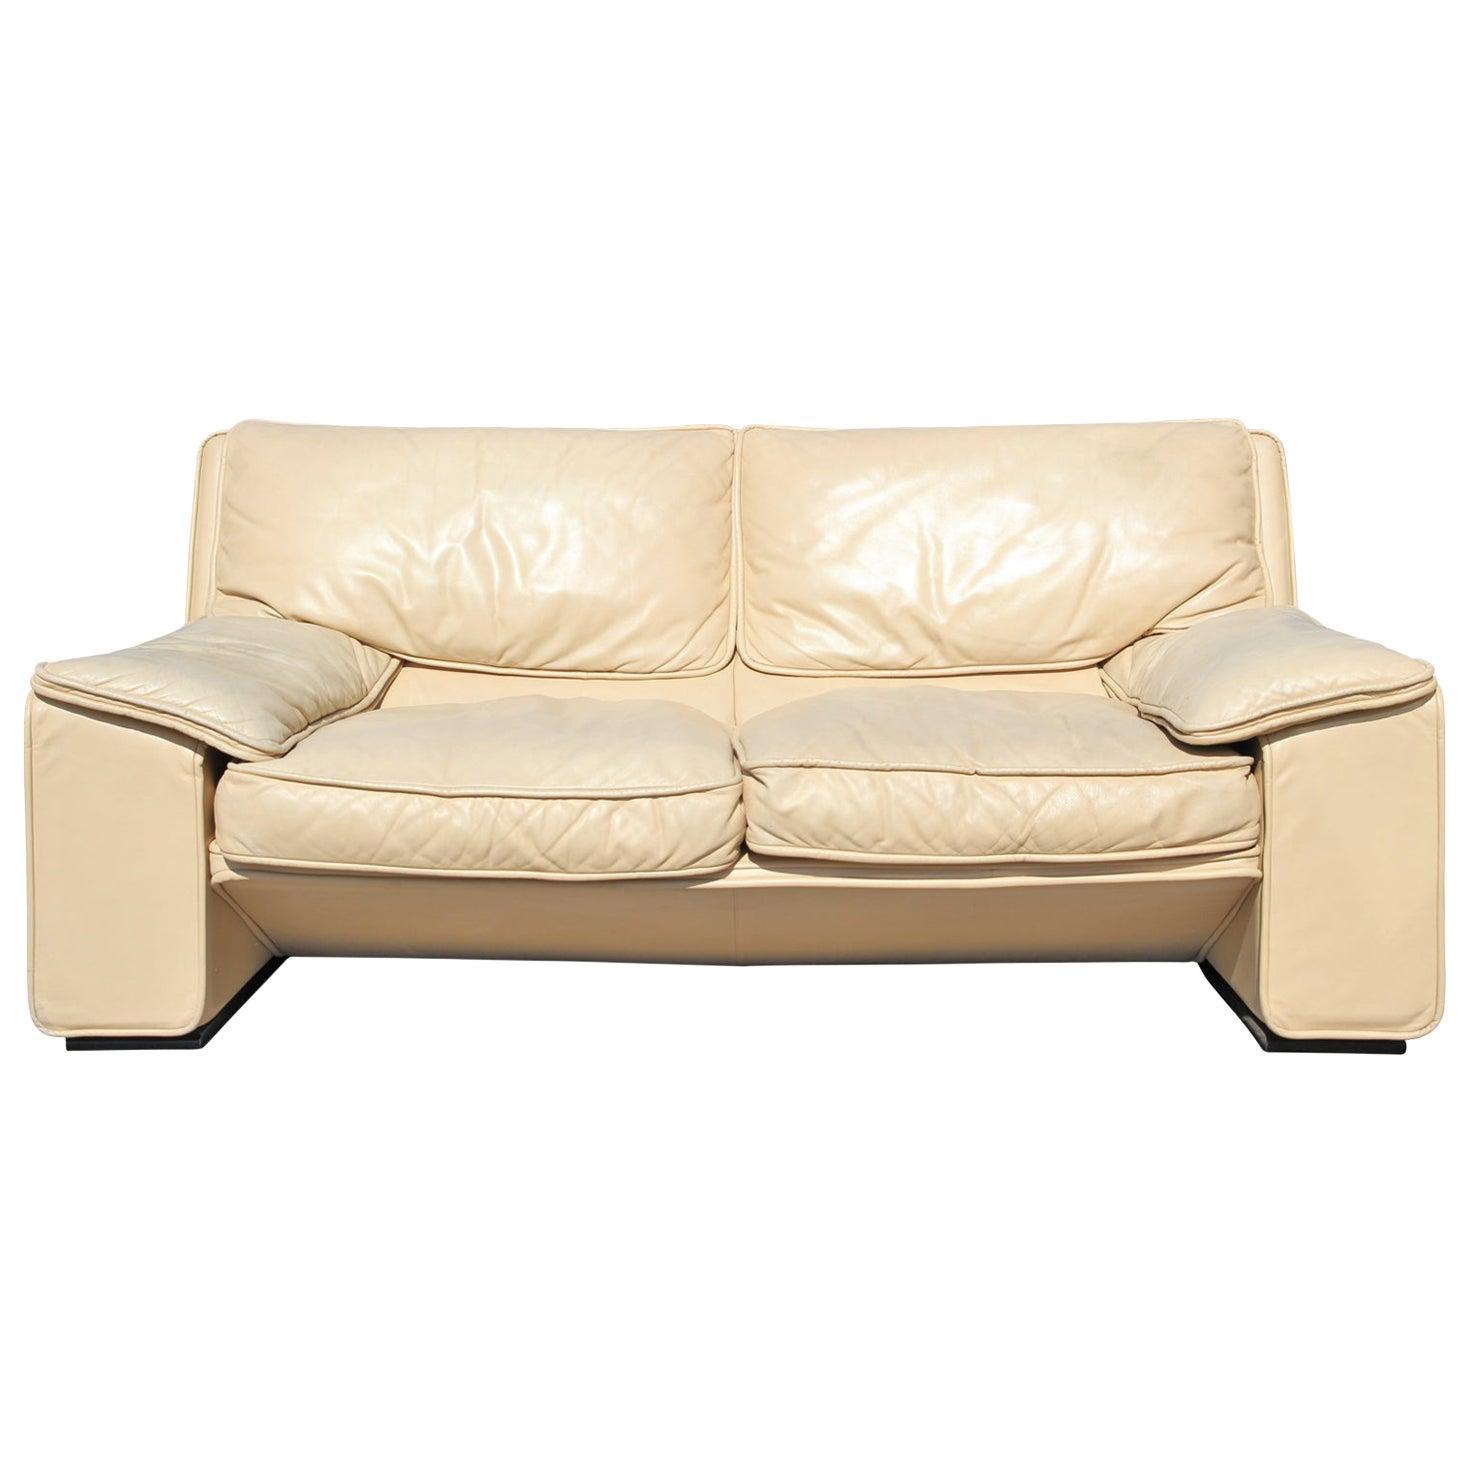 Roche Bobois Style Brunati Postmodern Italian Leather Two-Seat Sofa / Settee